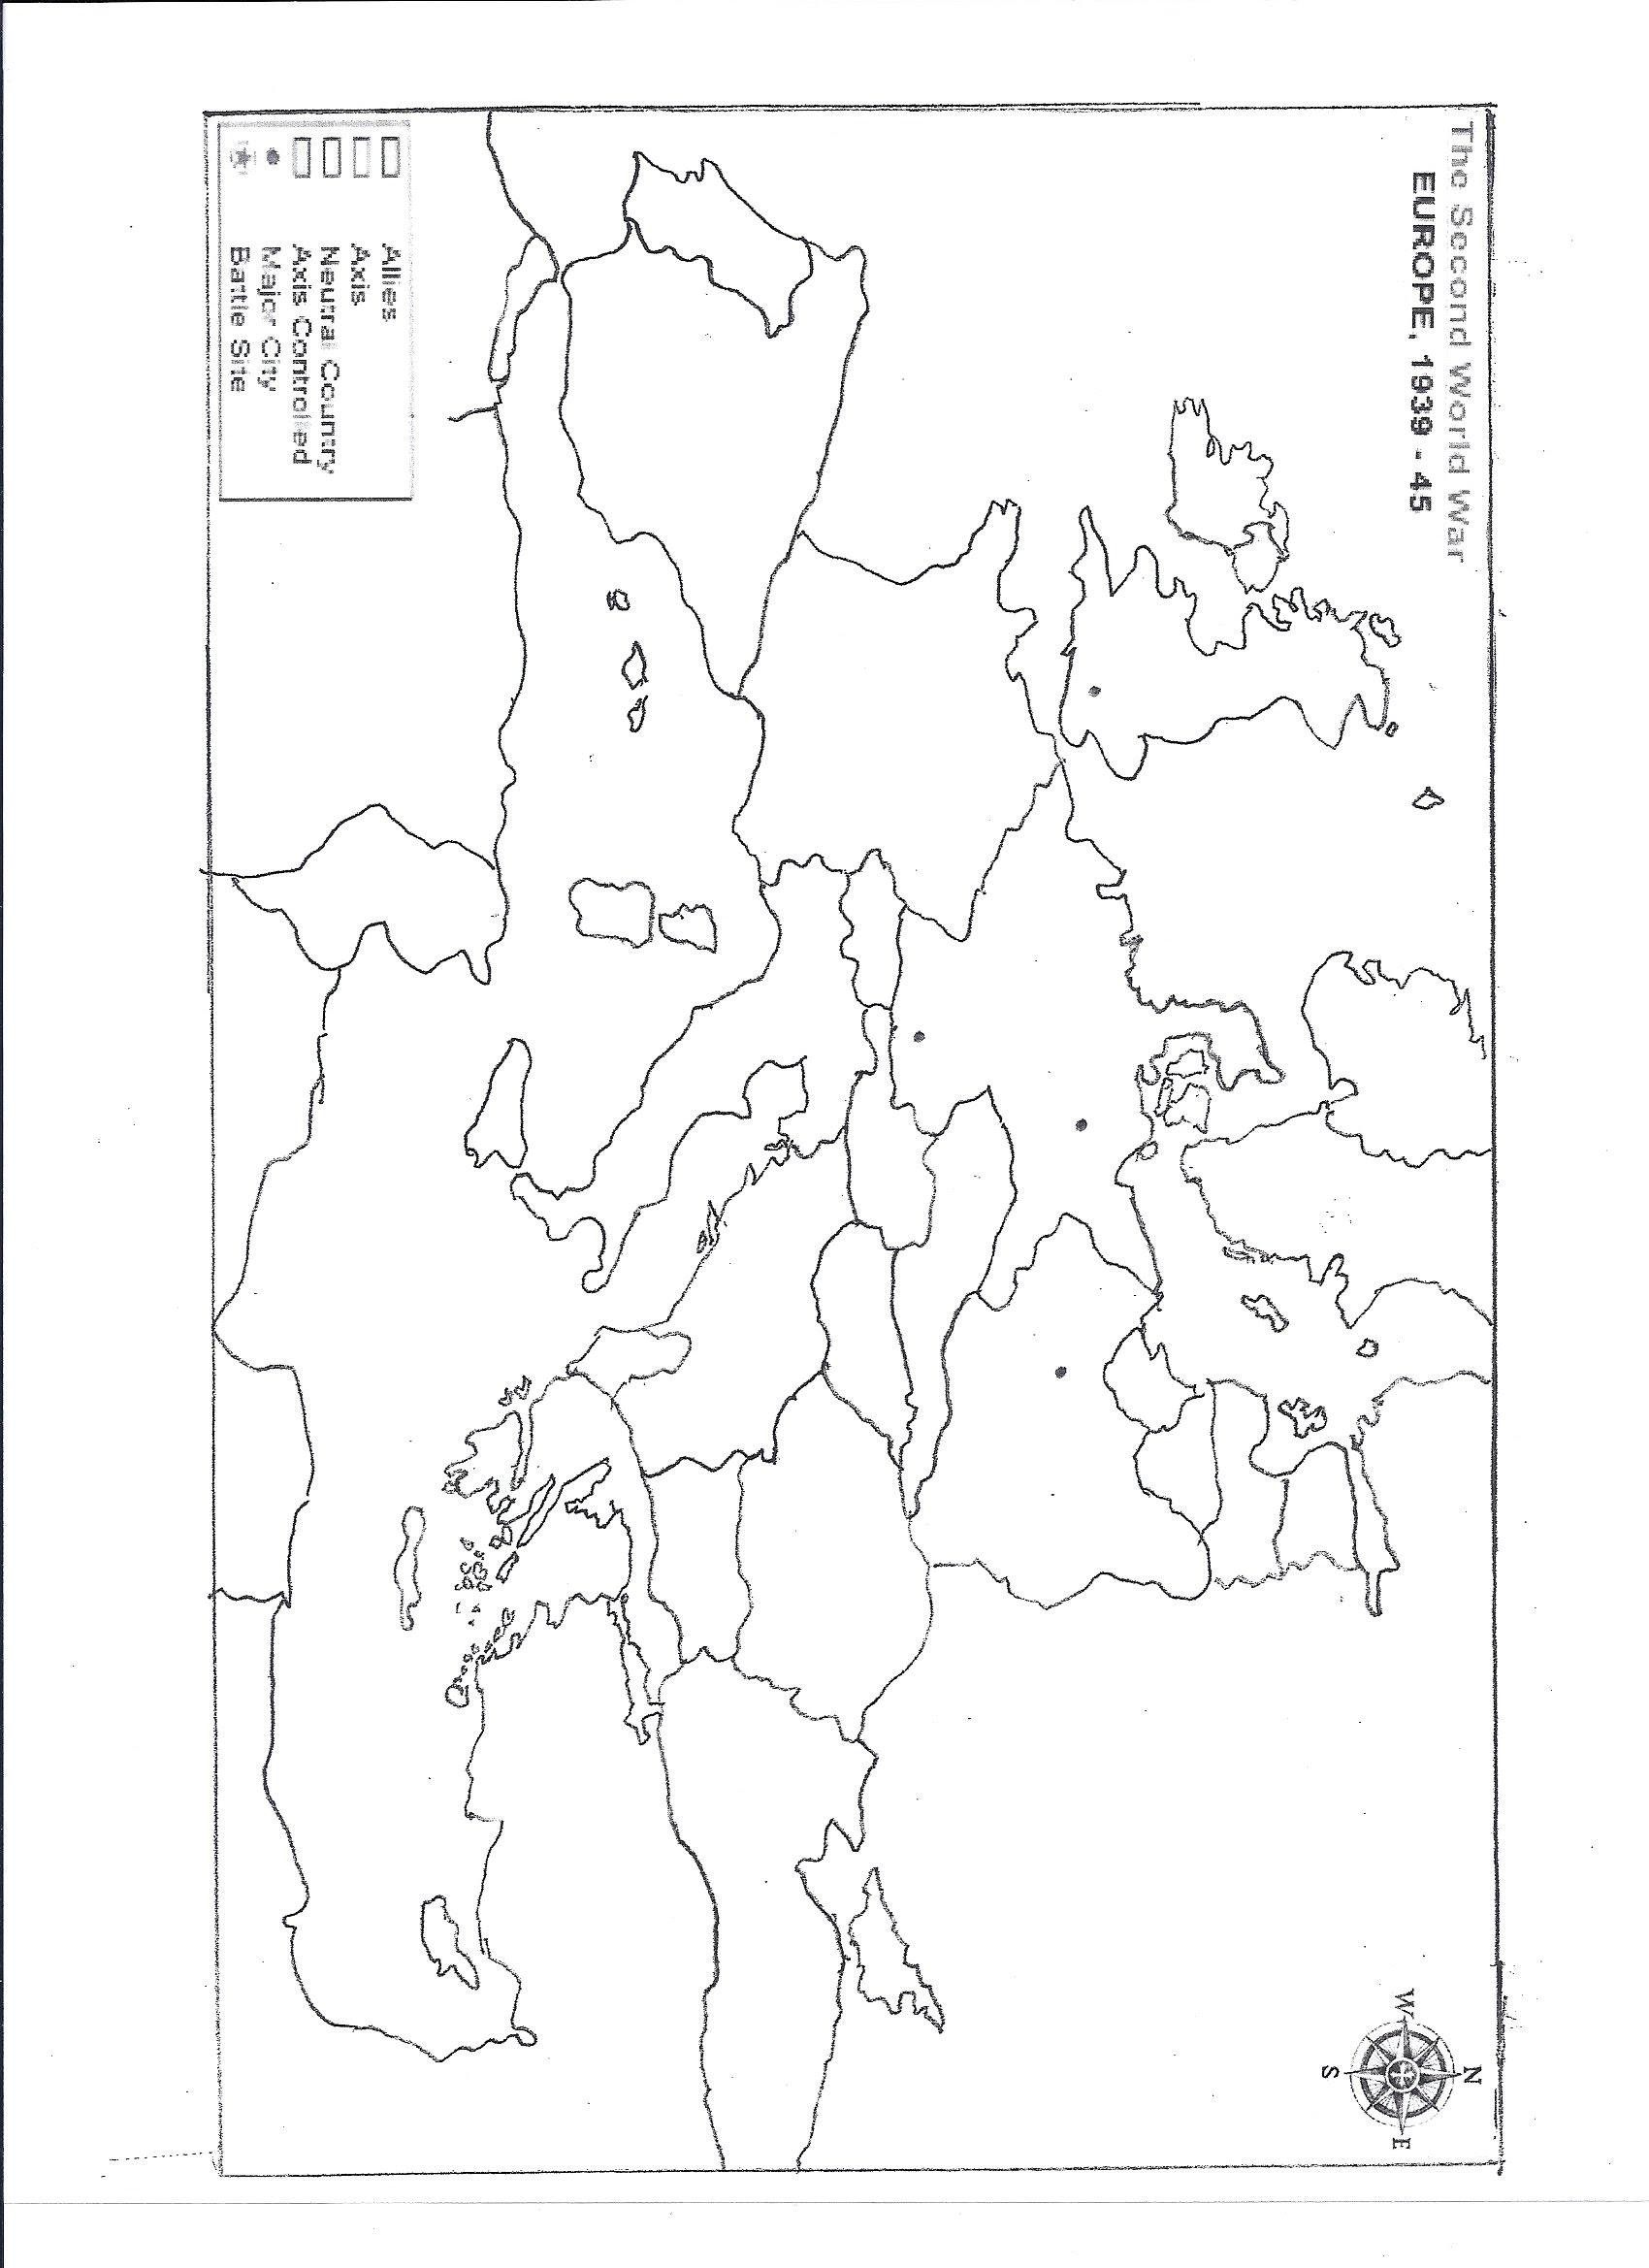 Bl Nkm Peurope1939 45